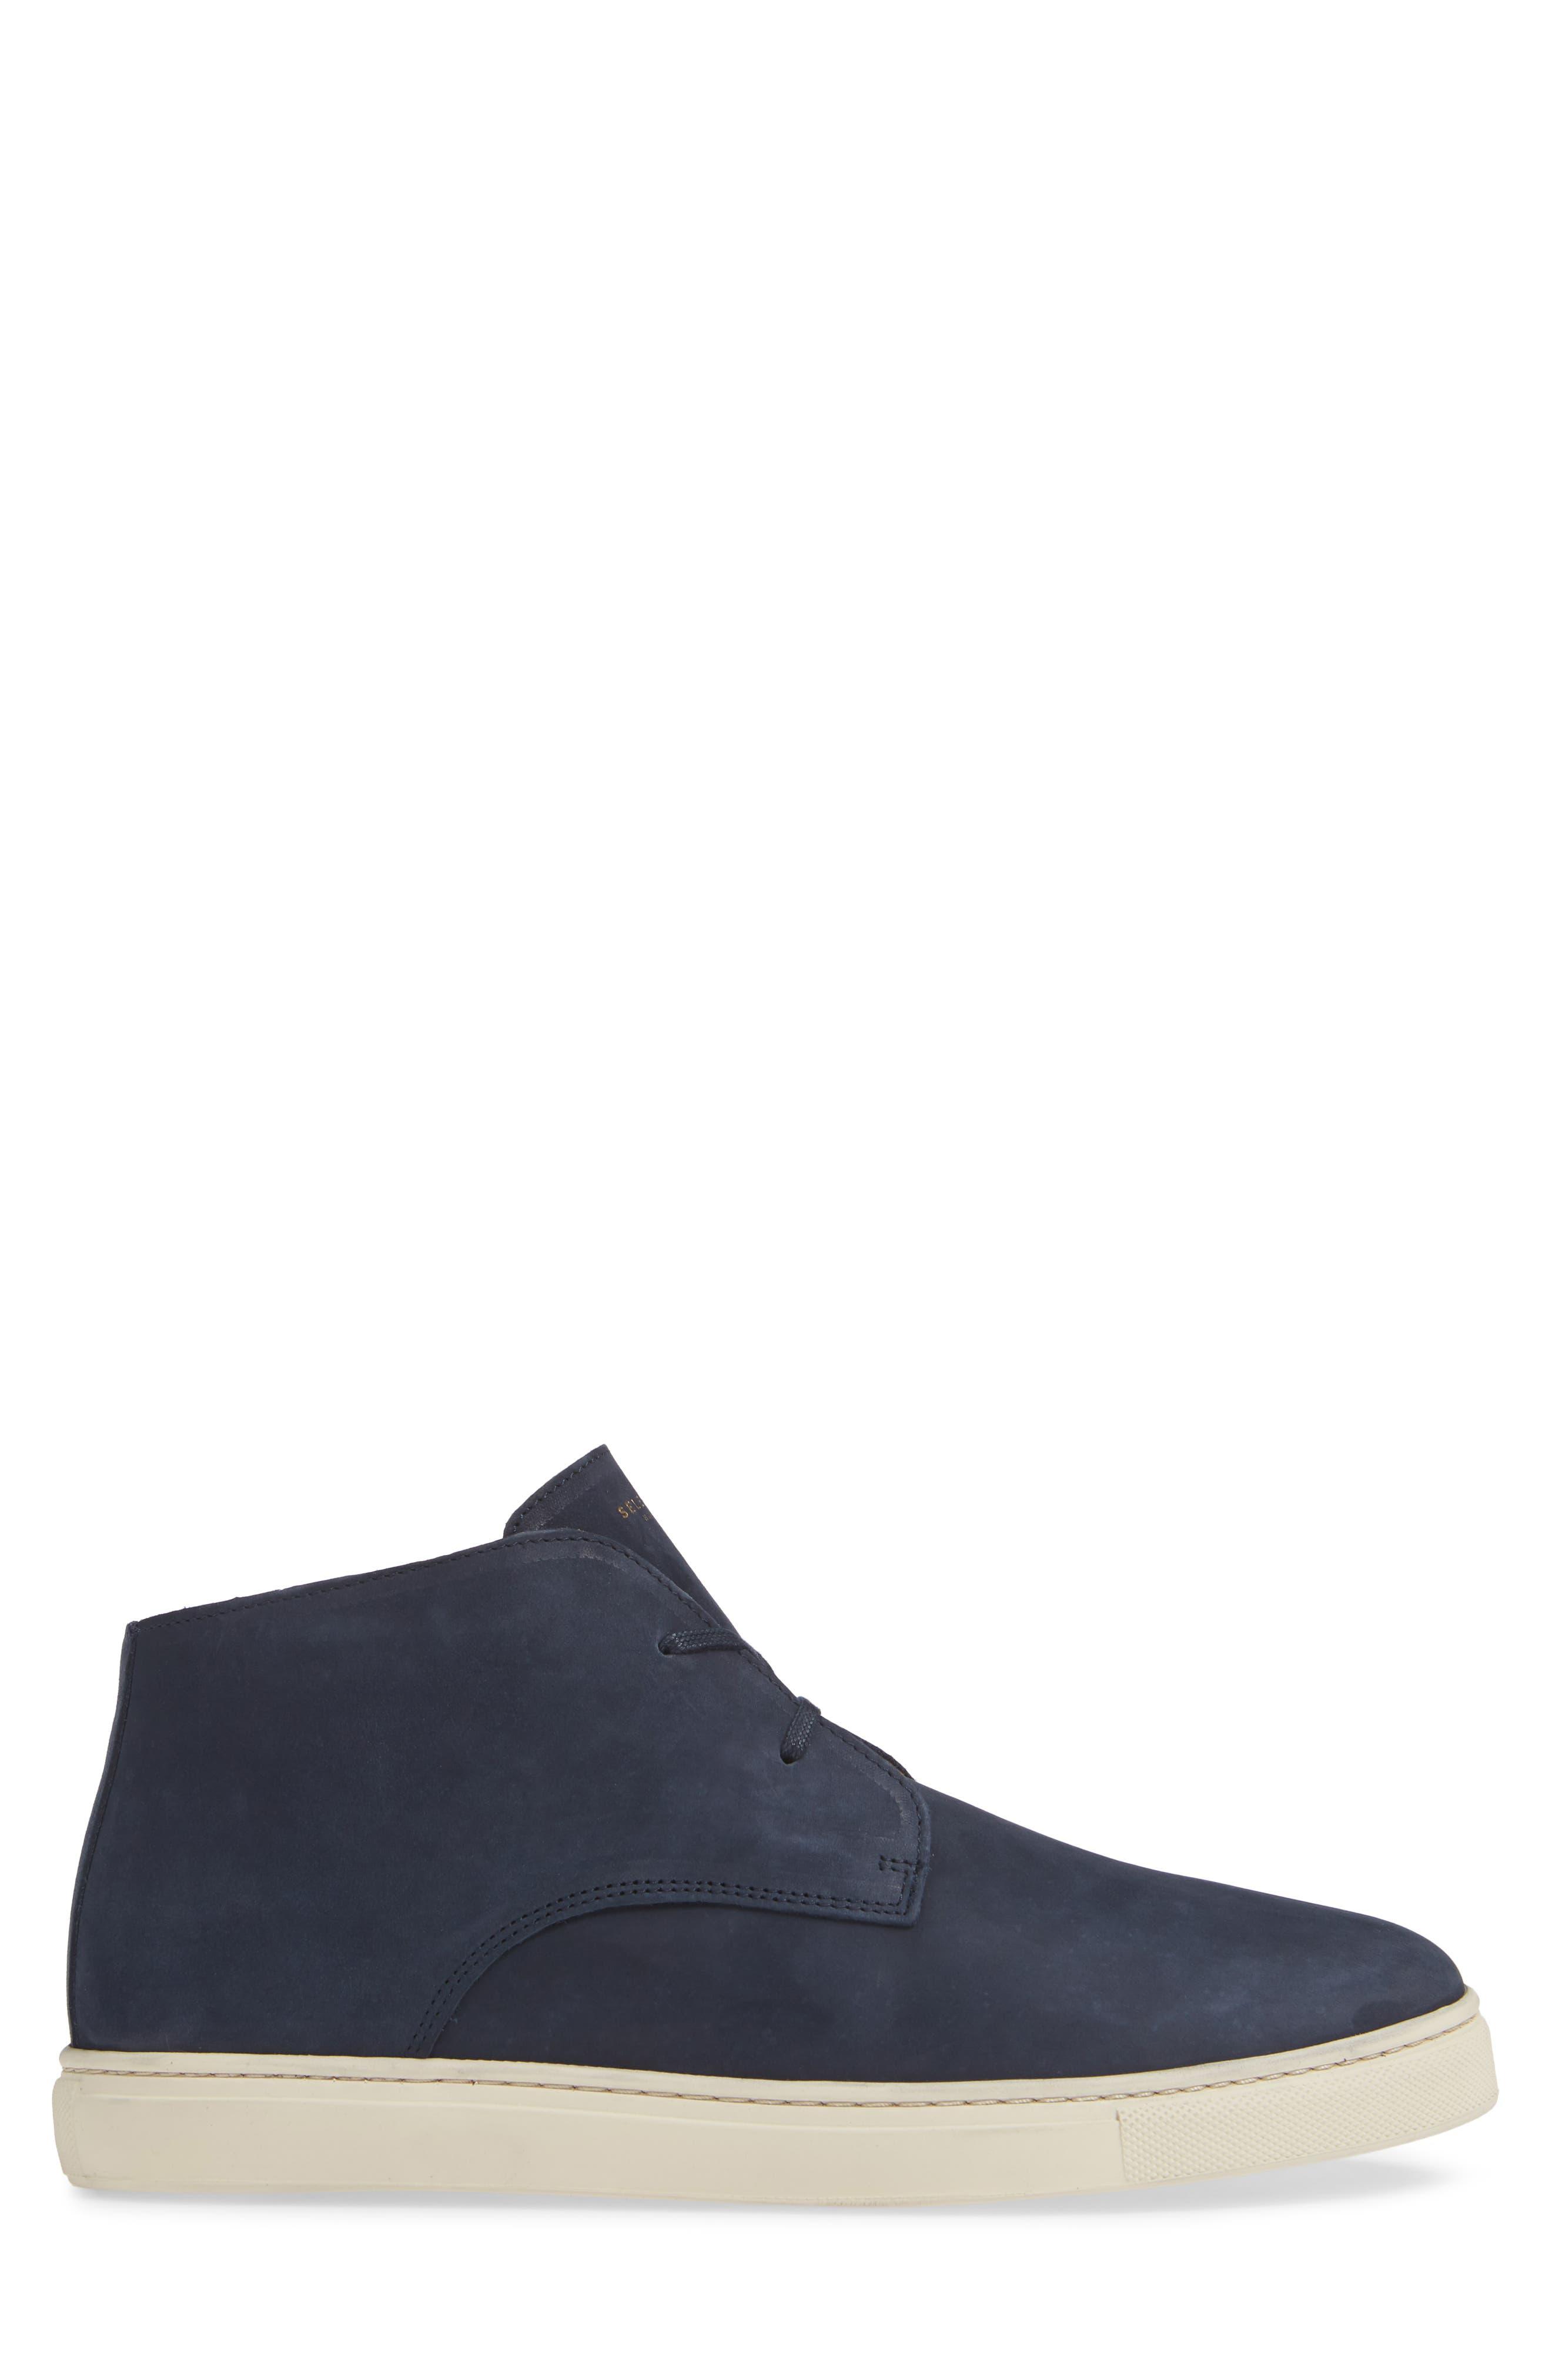 Dempsey Chukka Sneaker,                             Alternate thumbnail 3, color,                             DARK NAVY